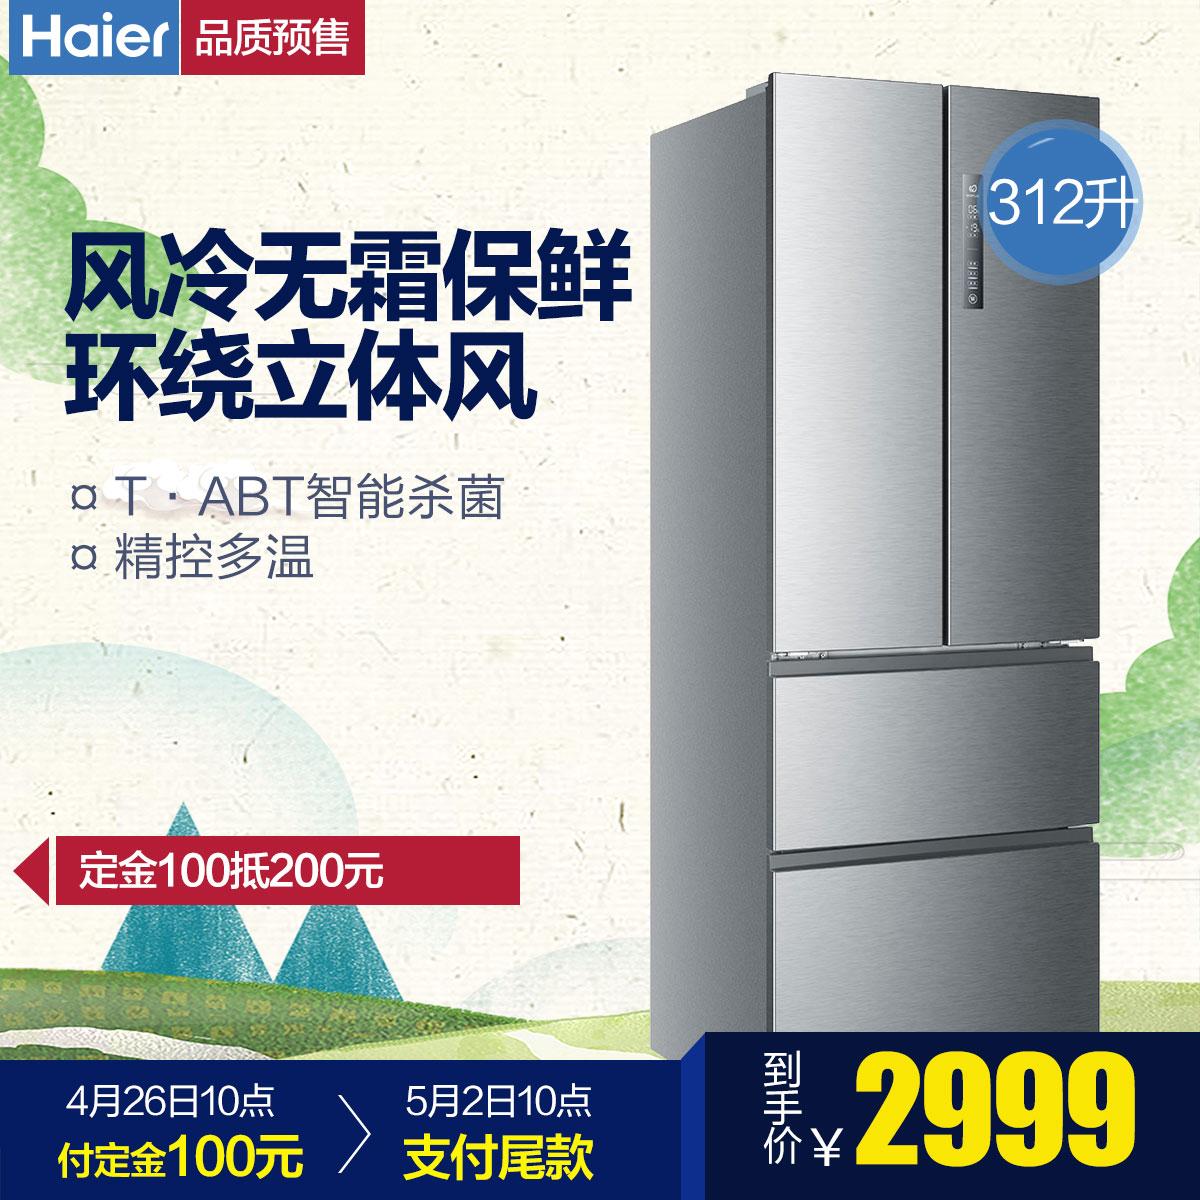 Haier/海尔 冰箱 BCD-312WDPM